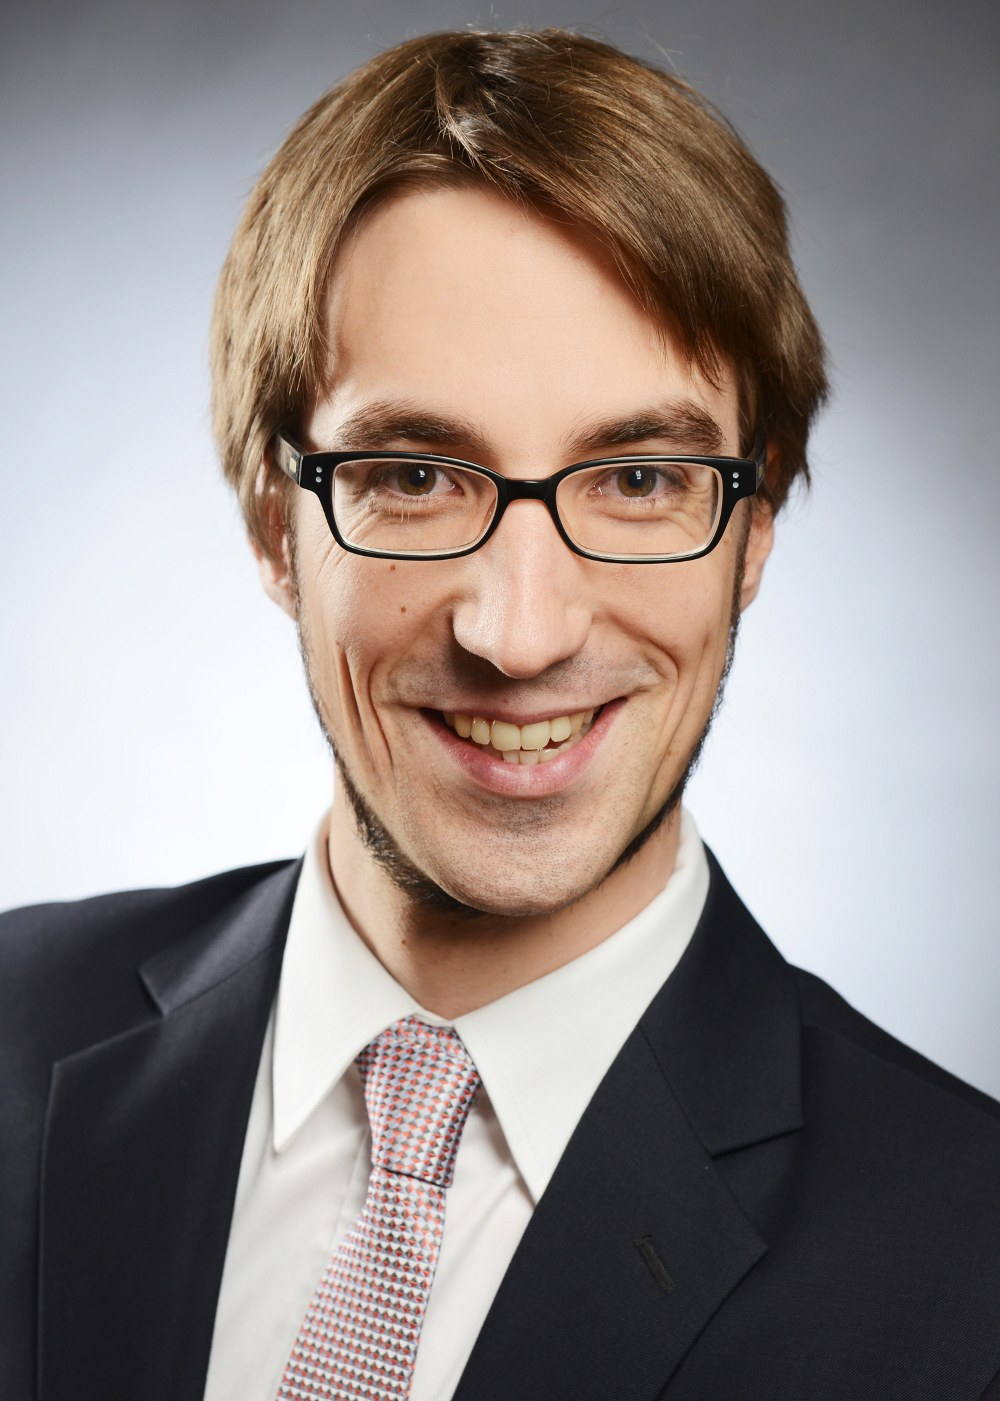 Peter Gladitz